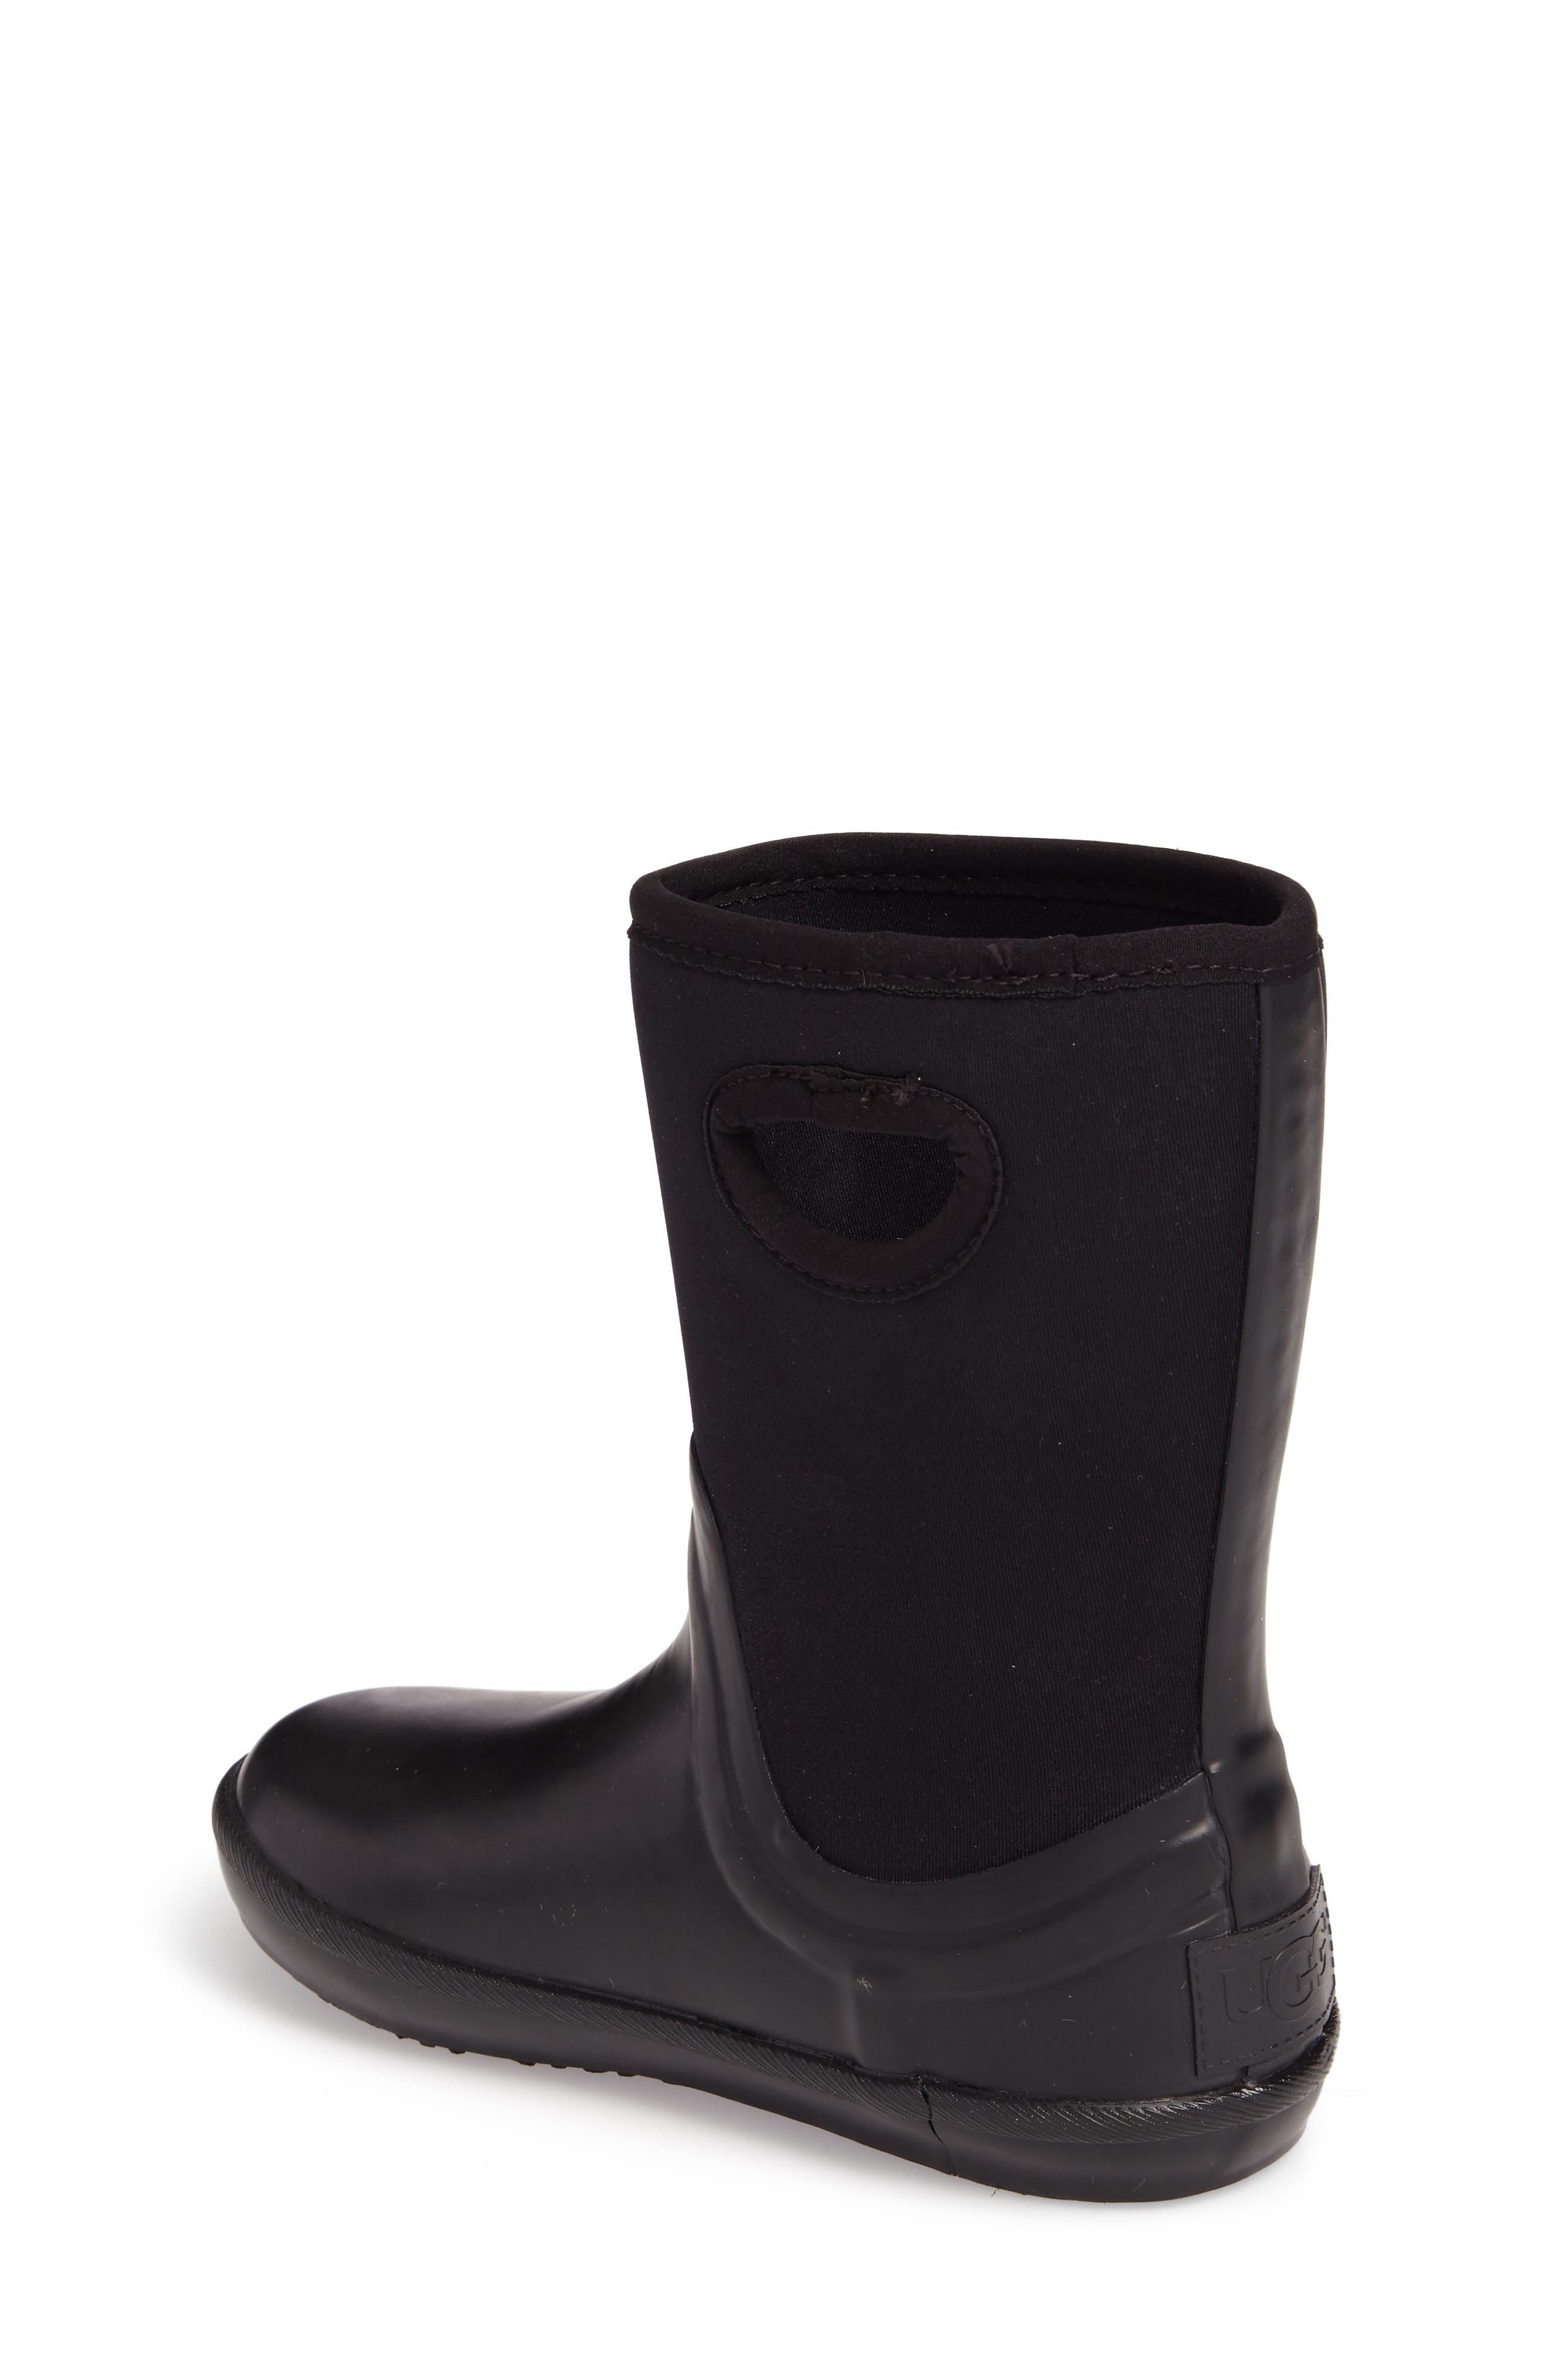 Kex Waterproof Boot,                             Alternate thumbnail 4, color,